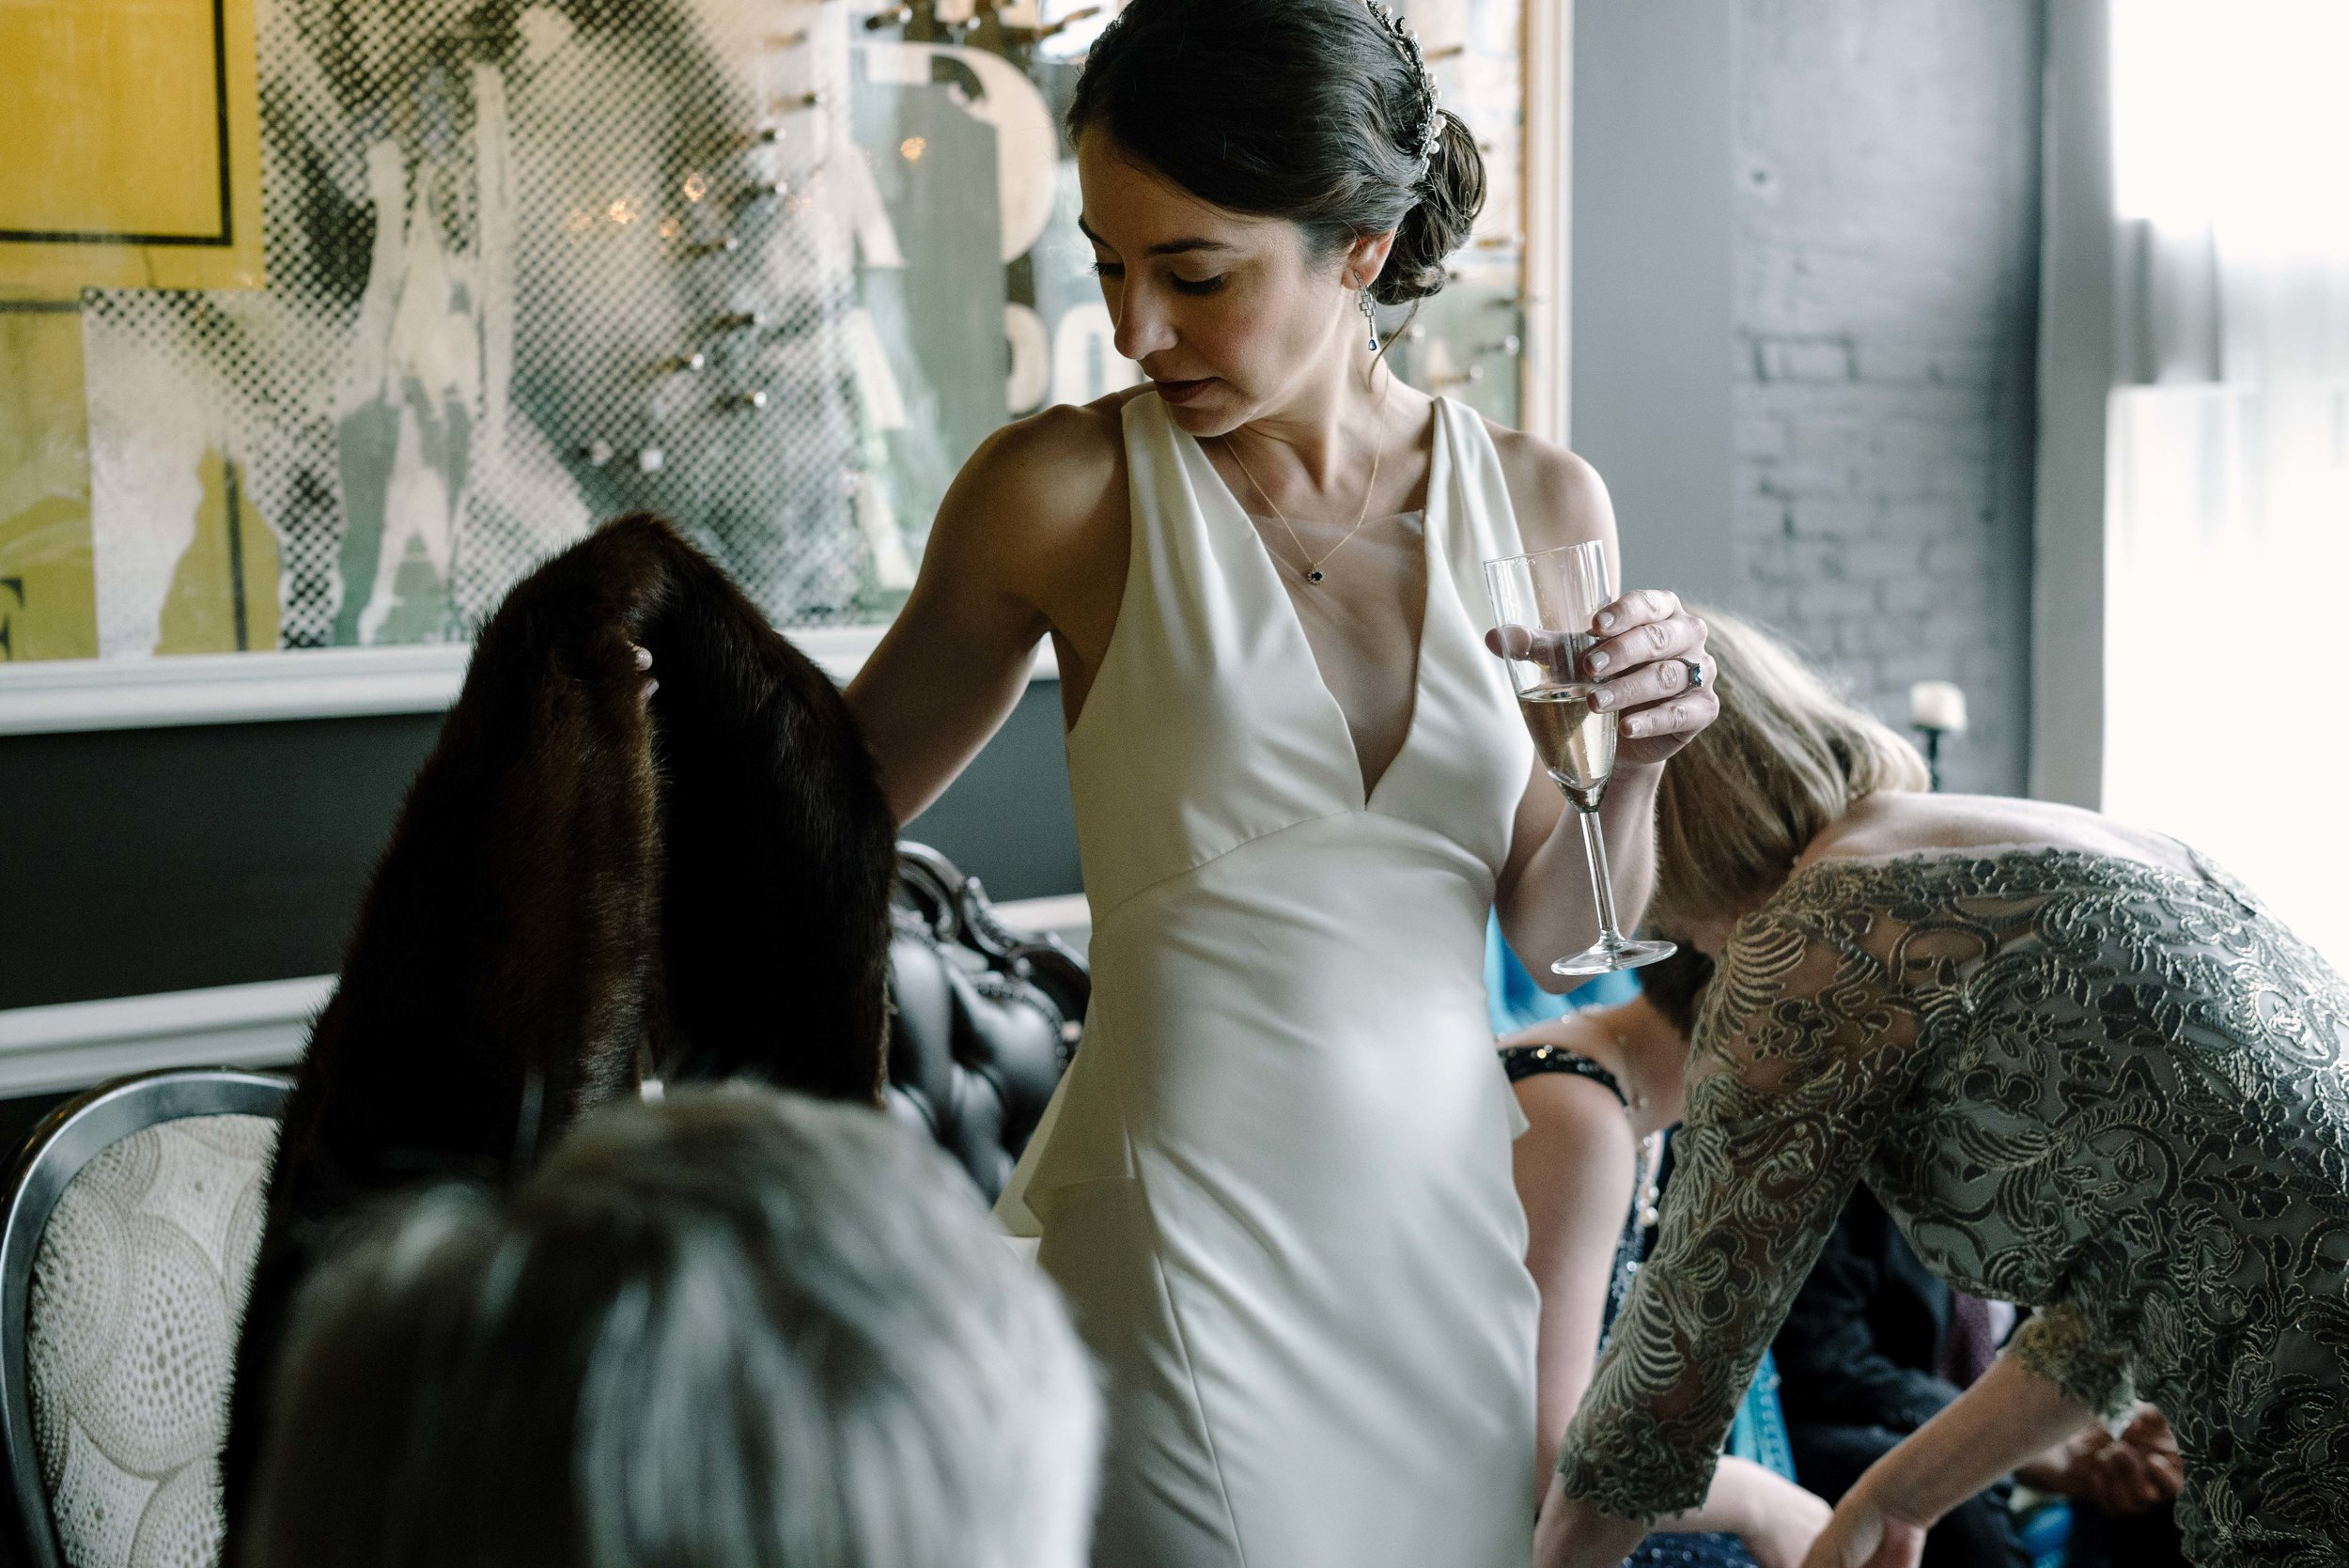 Patricia-Steve-Blog-Indianapolis-Wedding-47.jpg